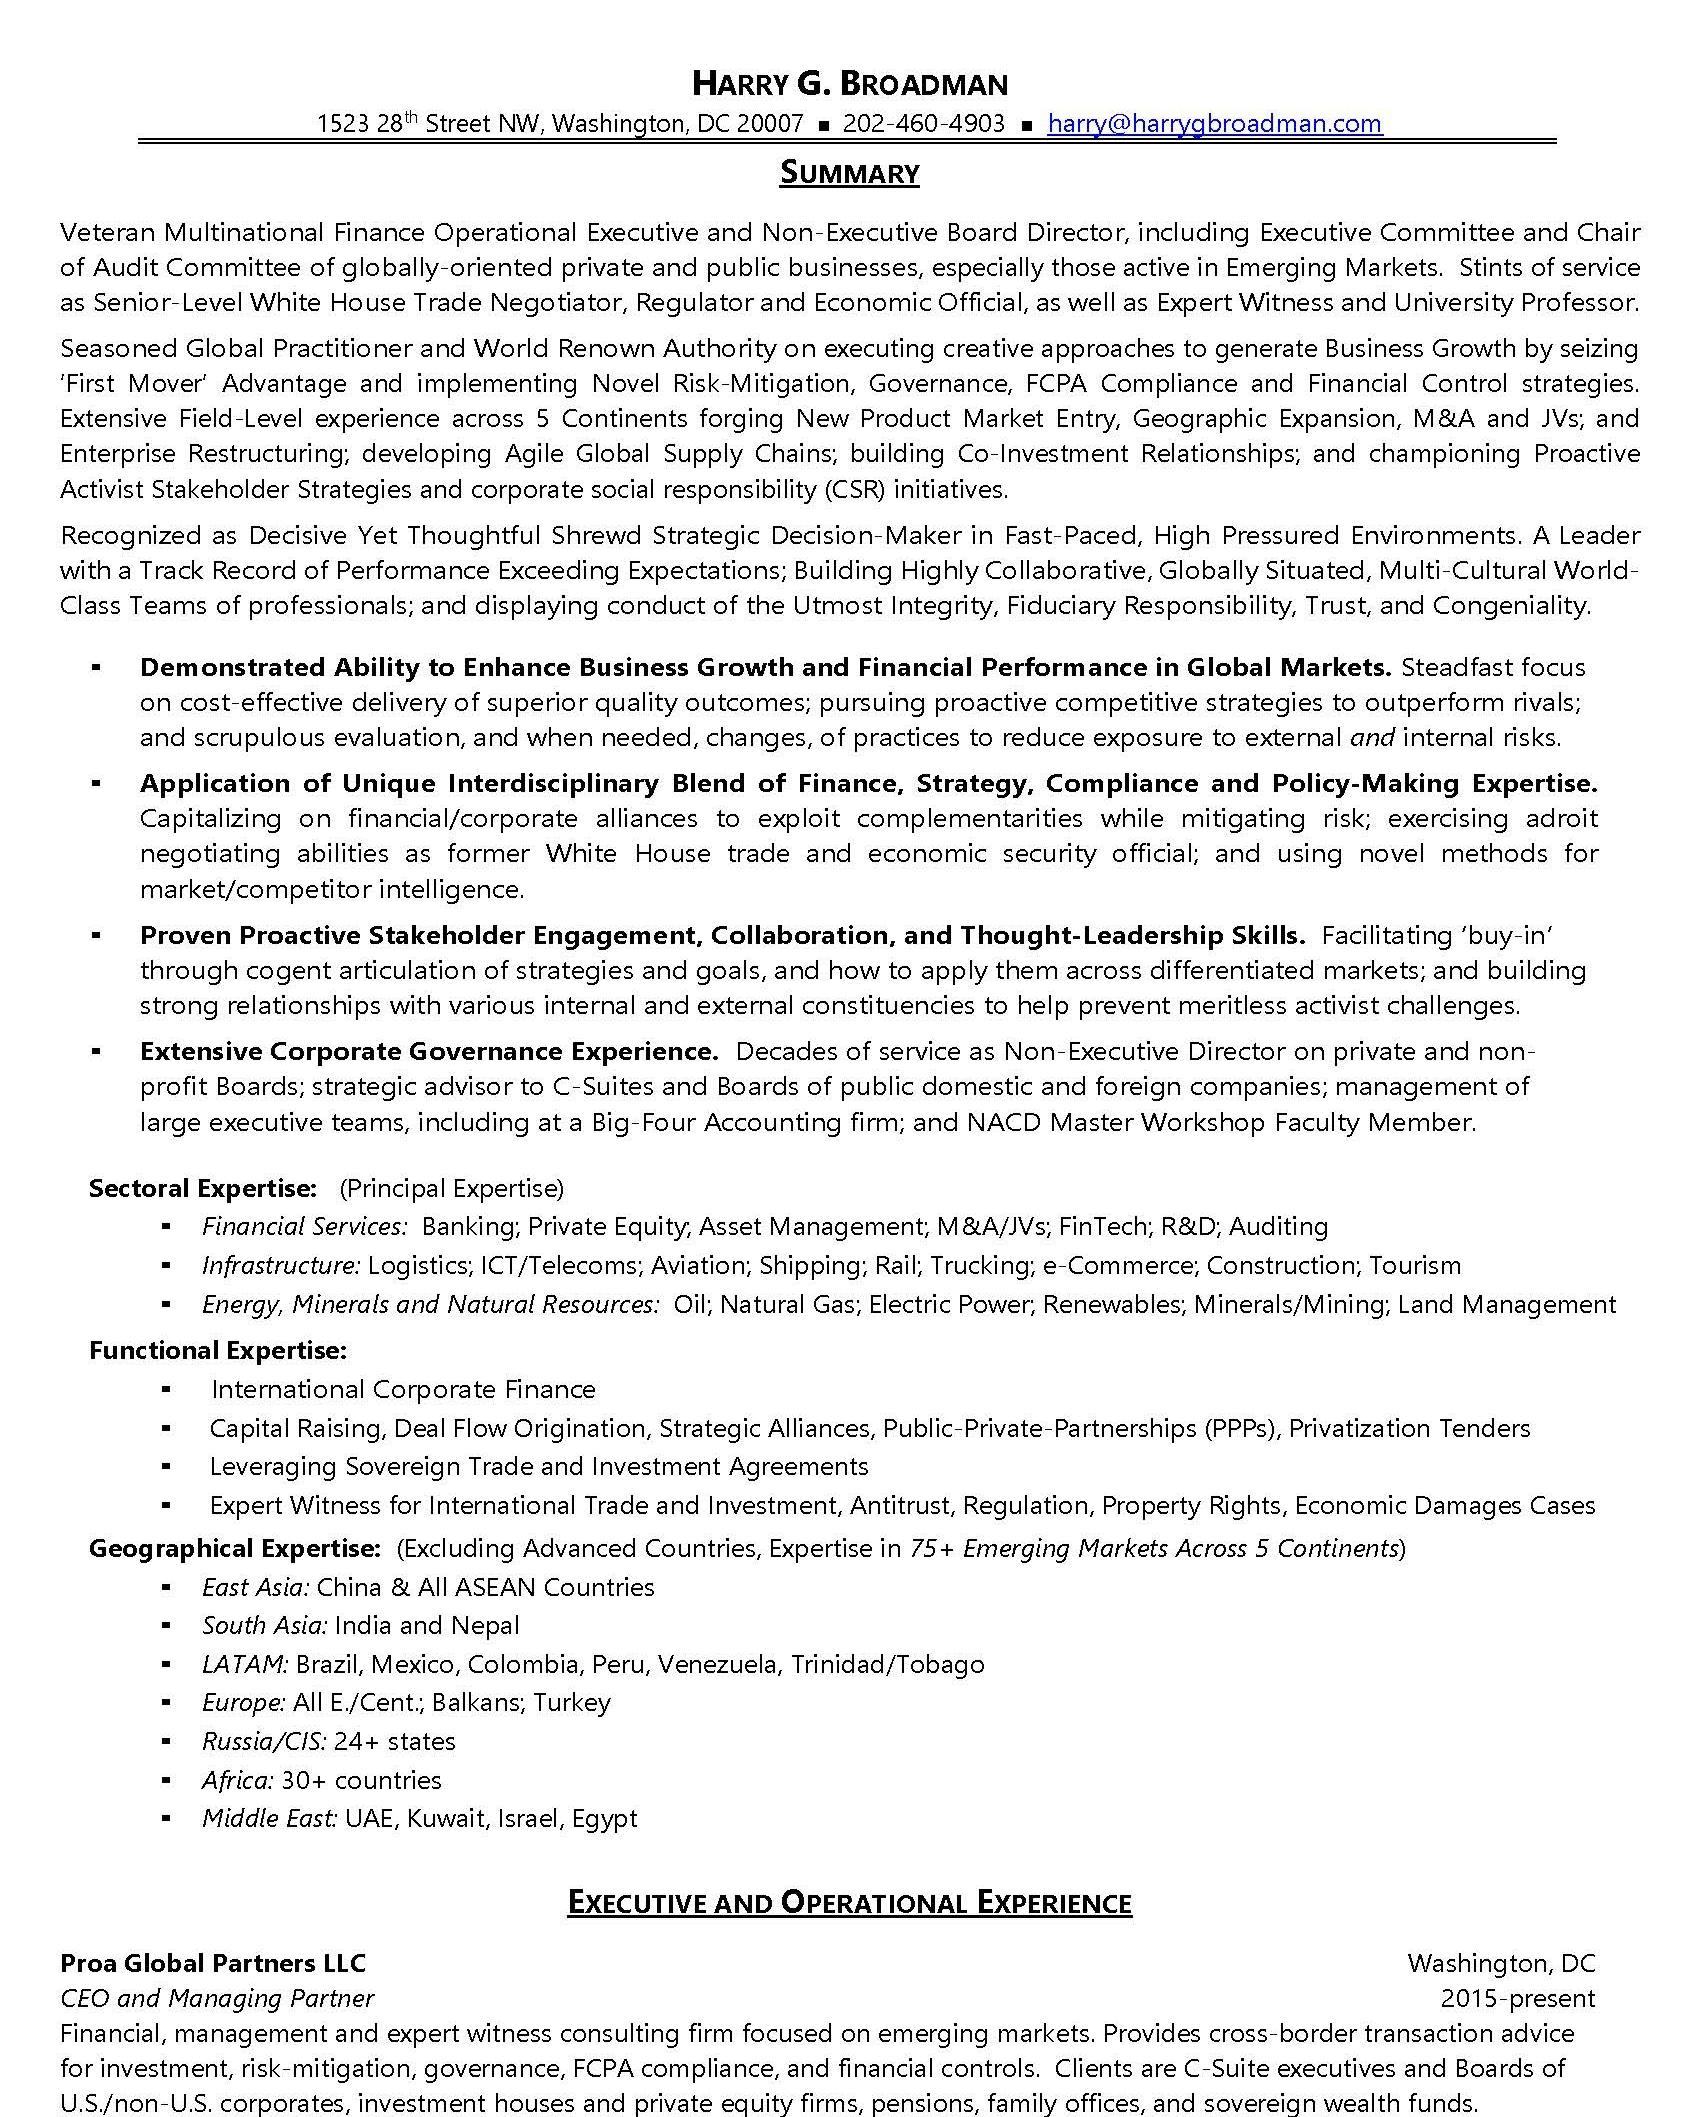 Broadman Detailed CV 5-7-18_Page_1.jpg